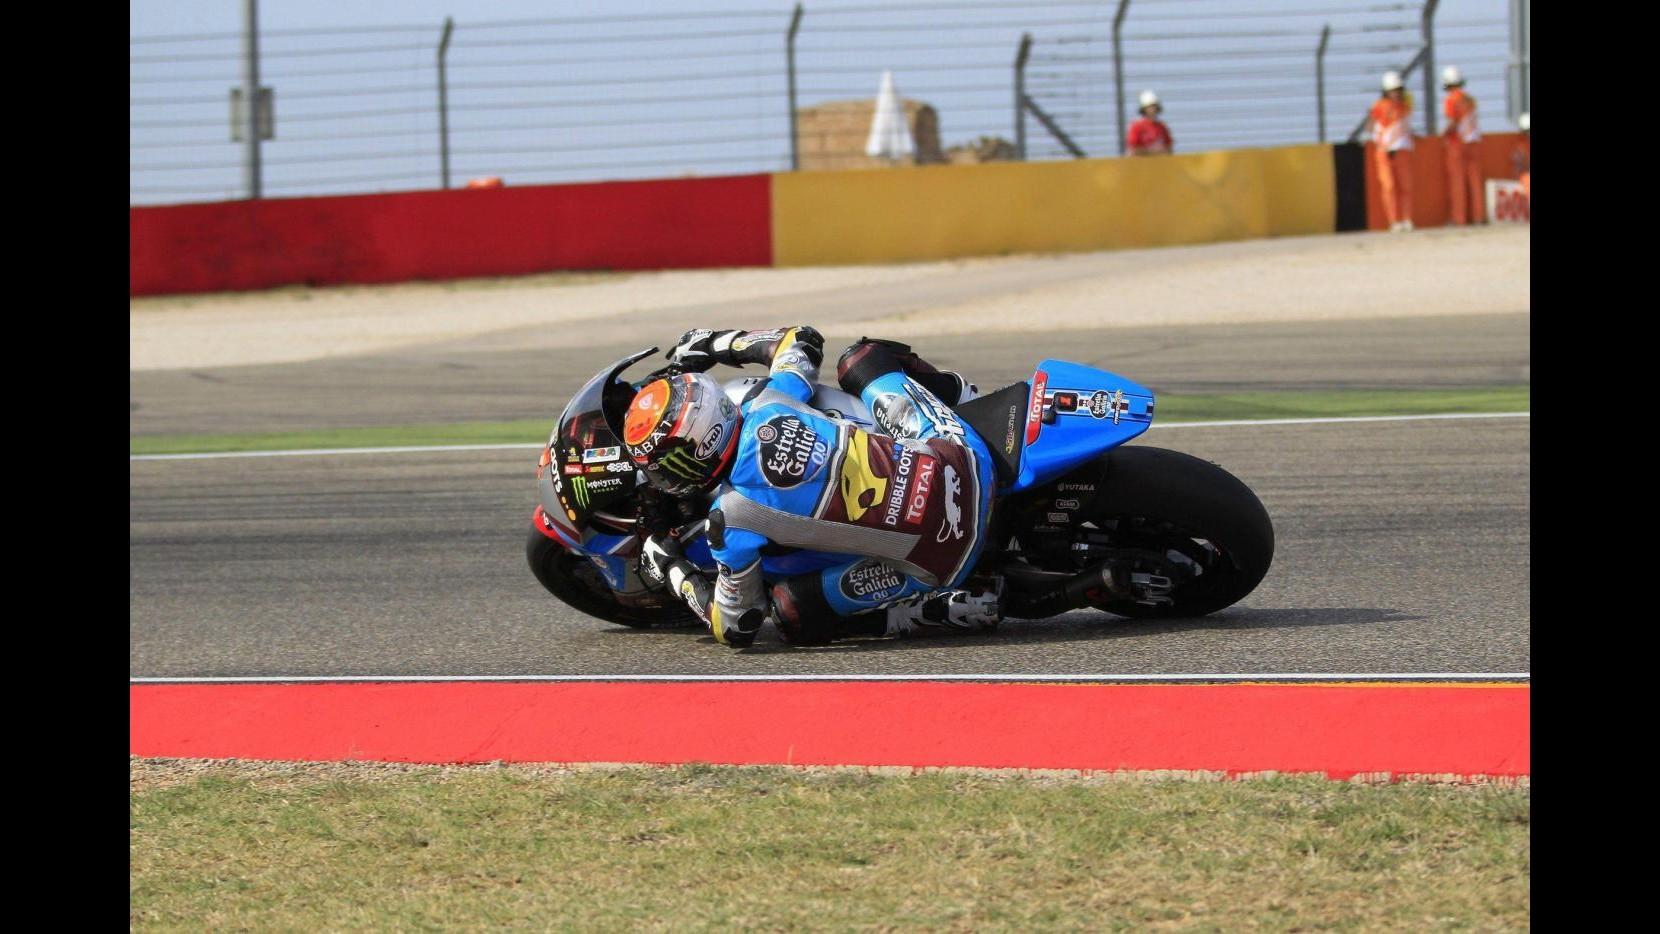 Motomondiale, Gp Aragon: Rabat trionfa in Moto2